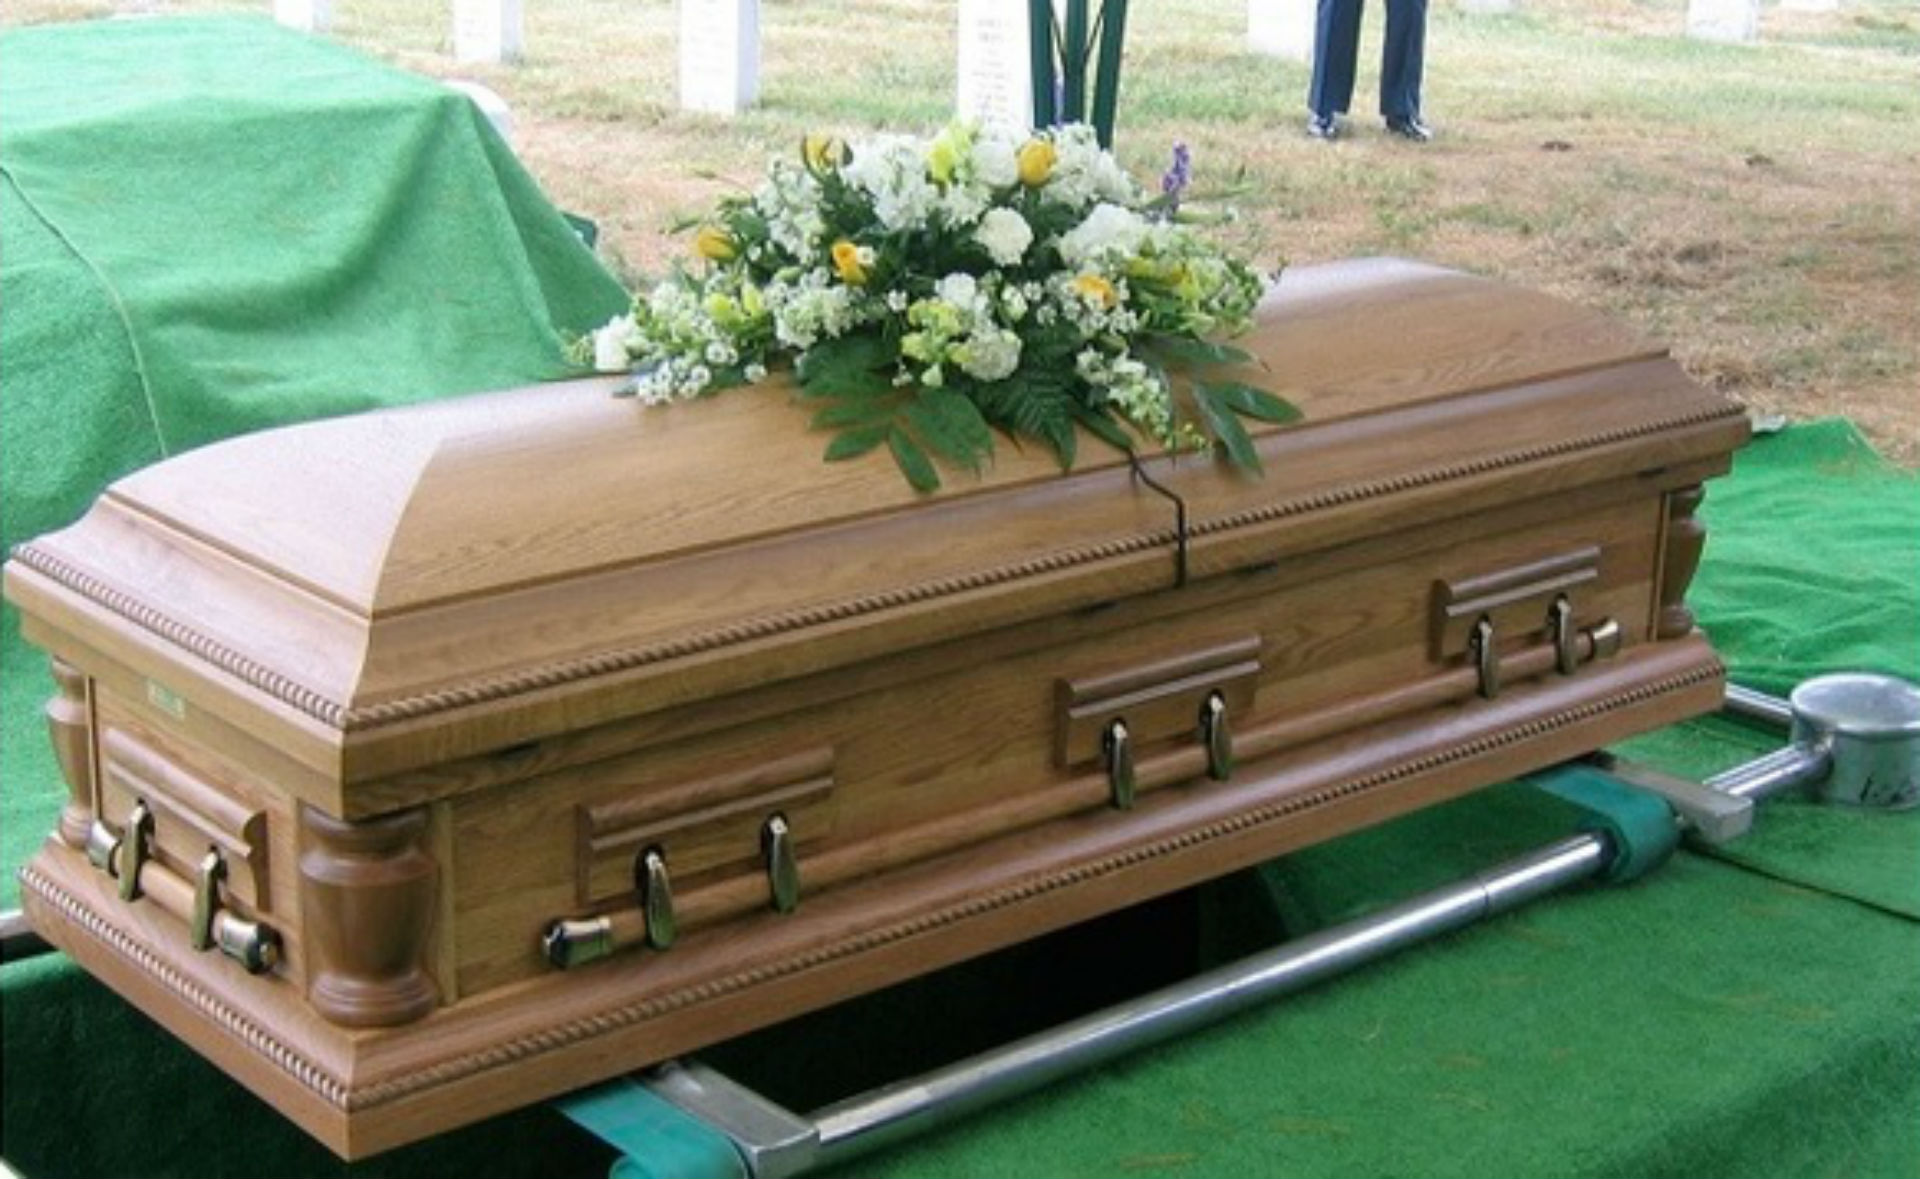 coffin_1537787041901-873772057.jpg